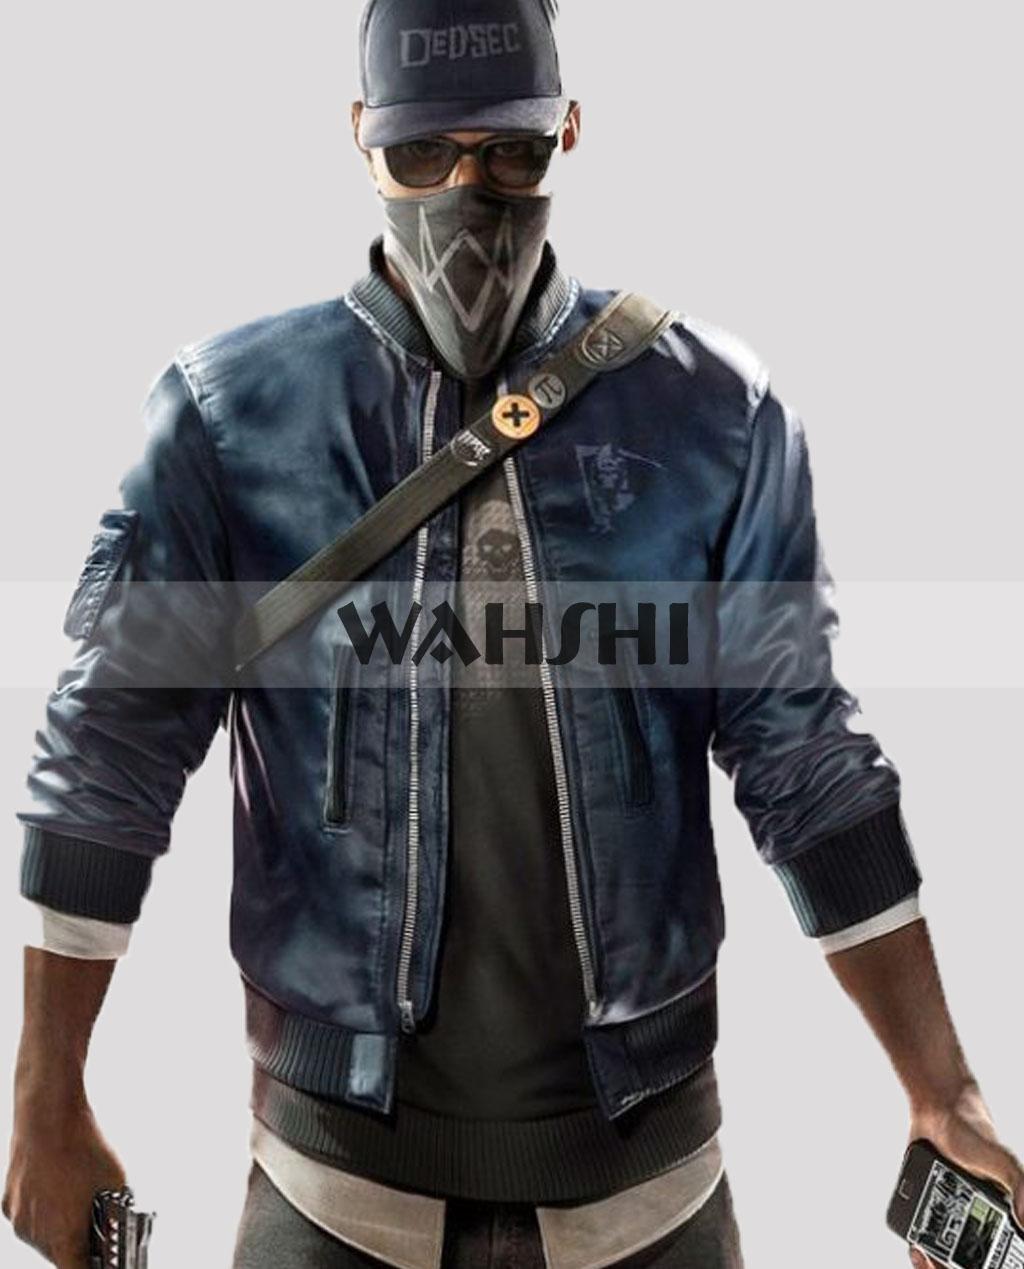 watch-dog-2-blue-jacket